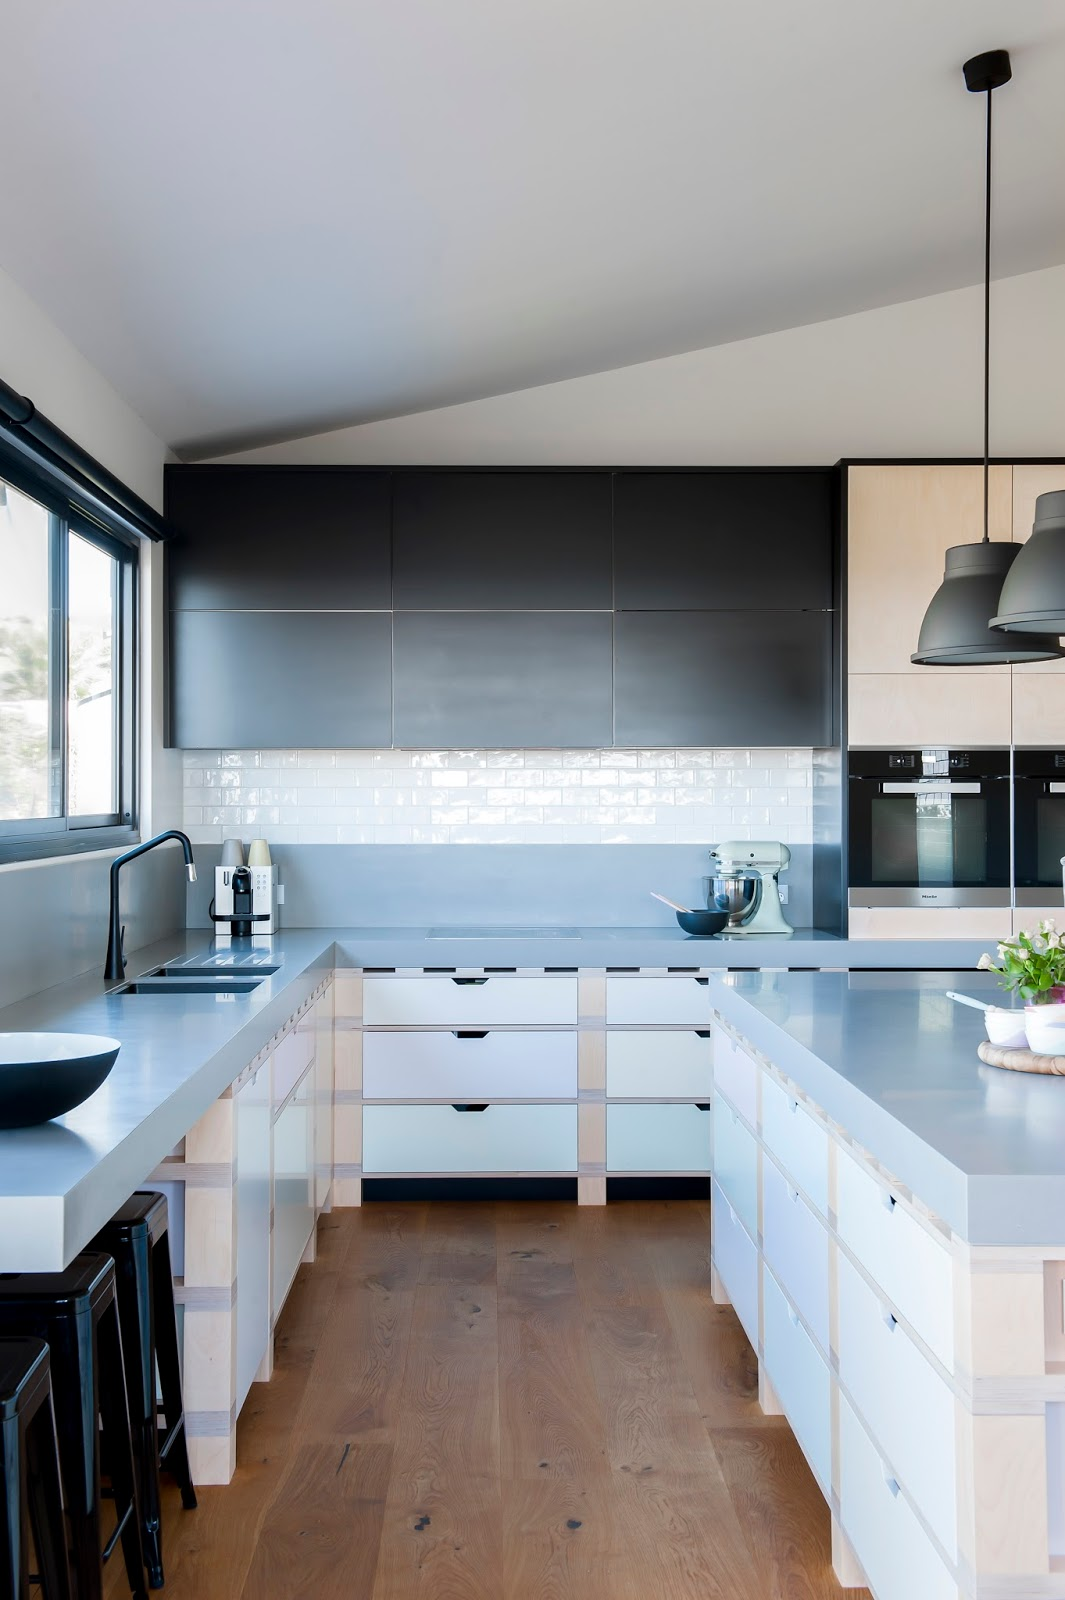 minosa award winning kitchen design palette construction song different wow corian plywood kiama holiday house%2b%25282%2529